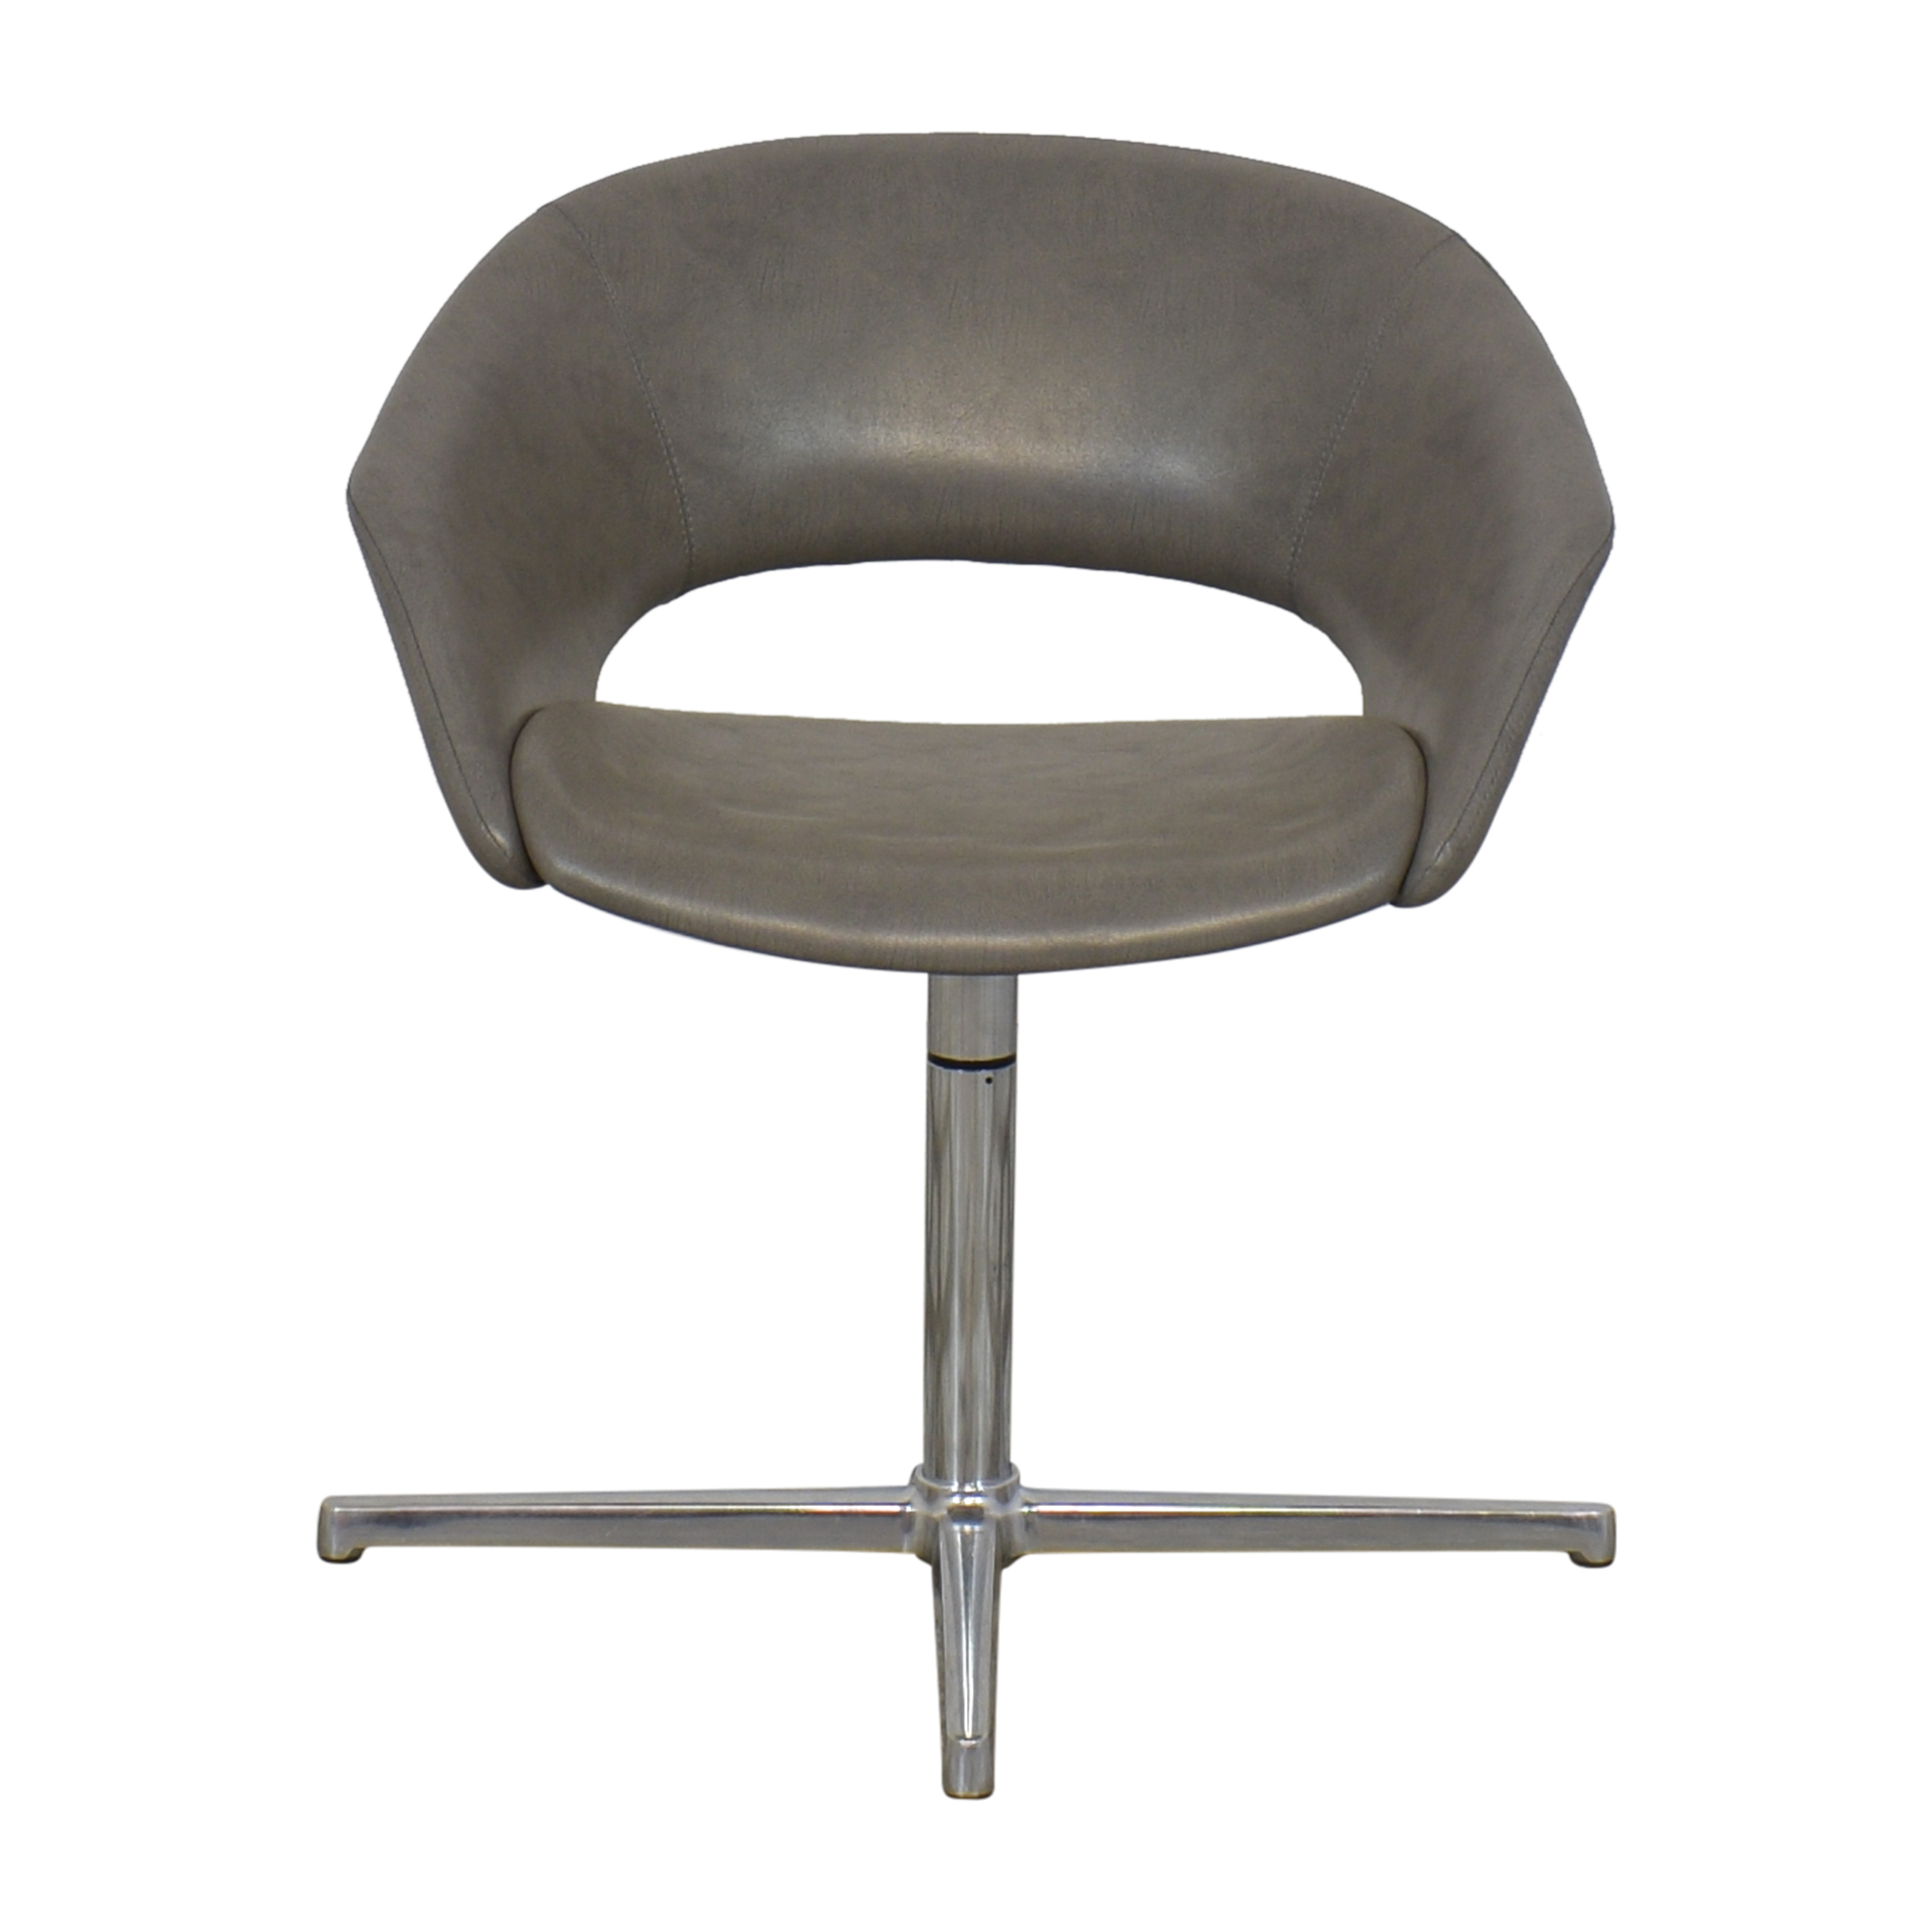 Leland International Leland Mod Pedestal Swivel Chair nj